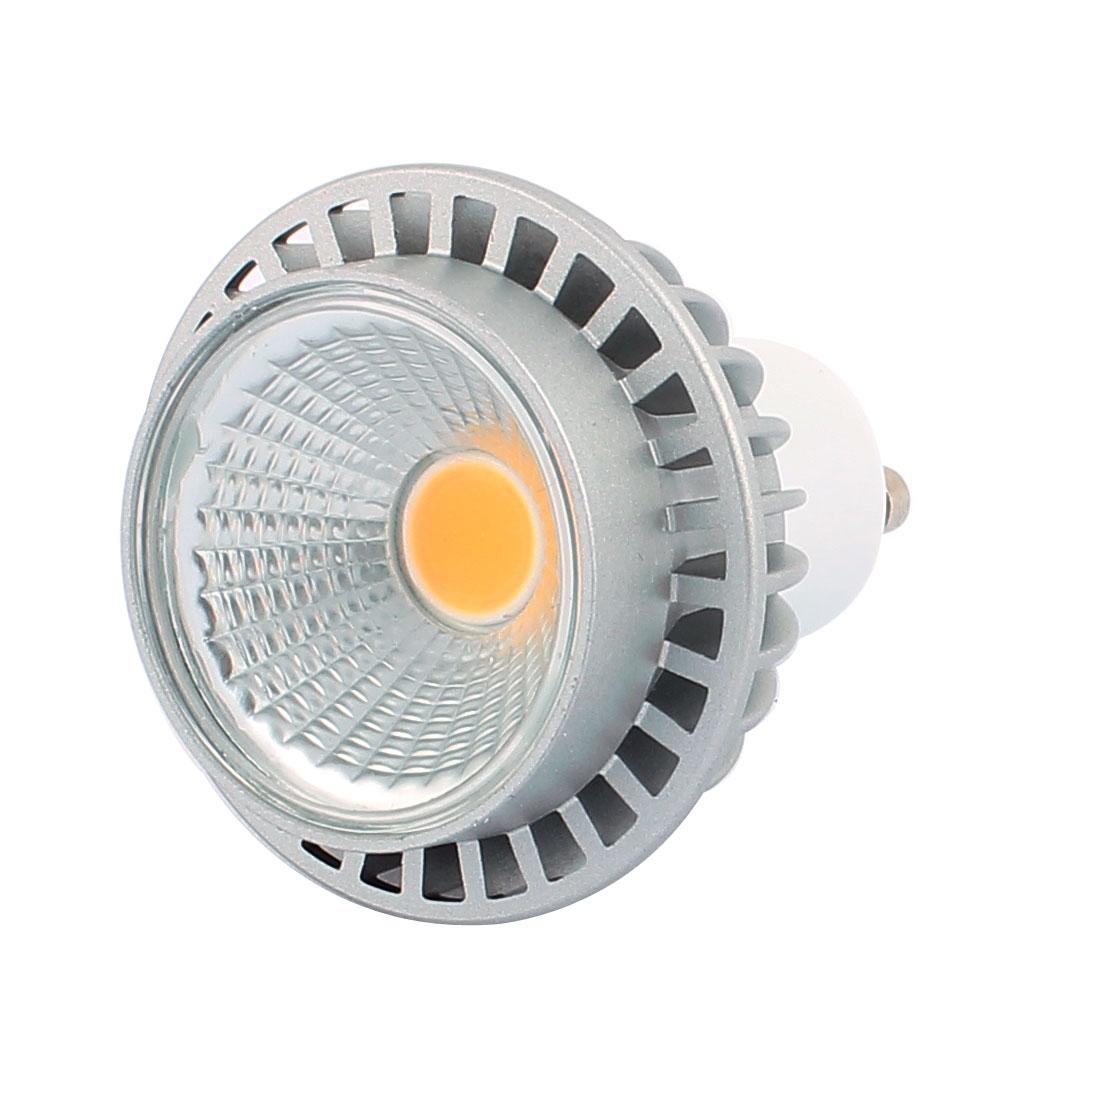 AC85-265V 3W GU10 COB LED 245LM Spotlight Lamp Bulb Downlight Warm White